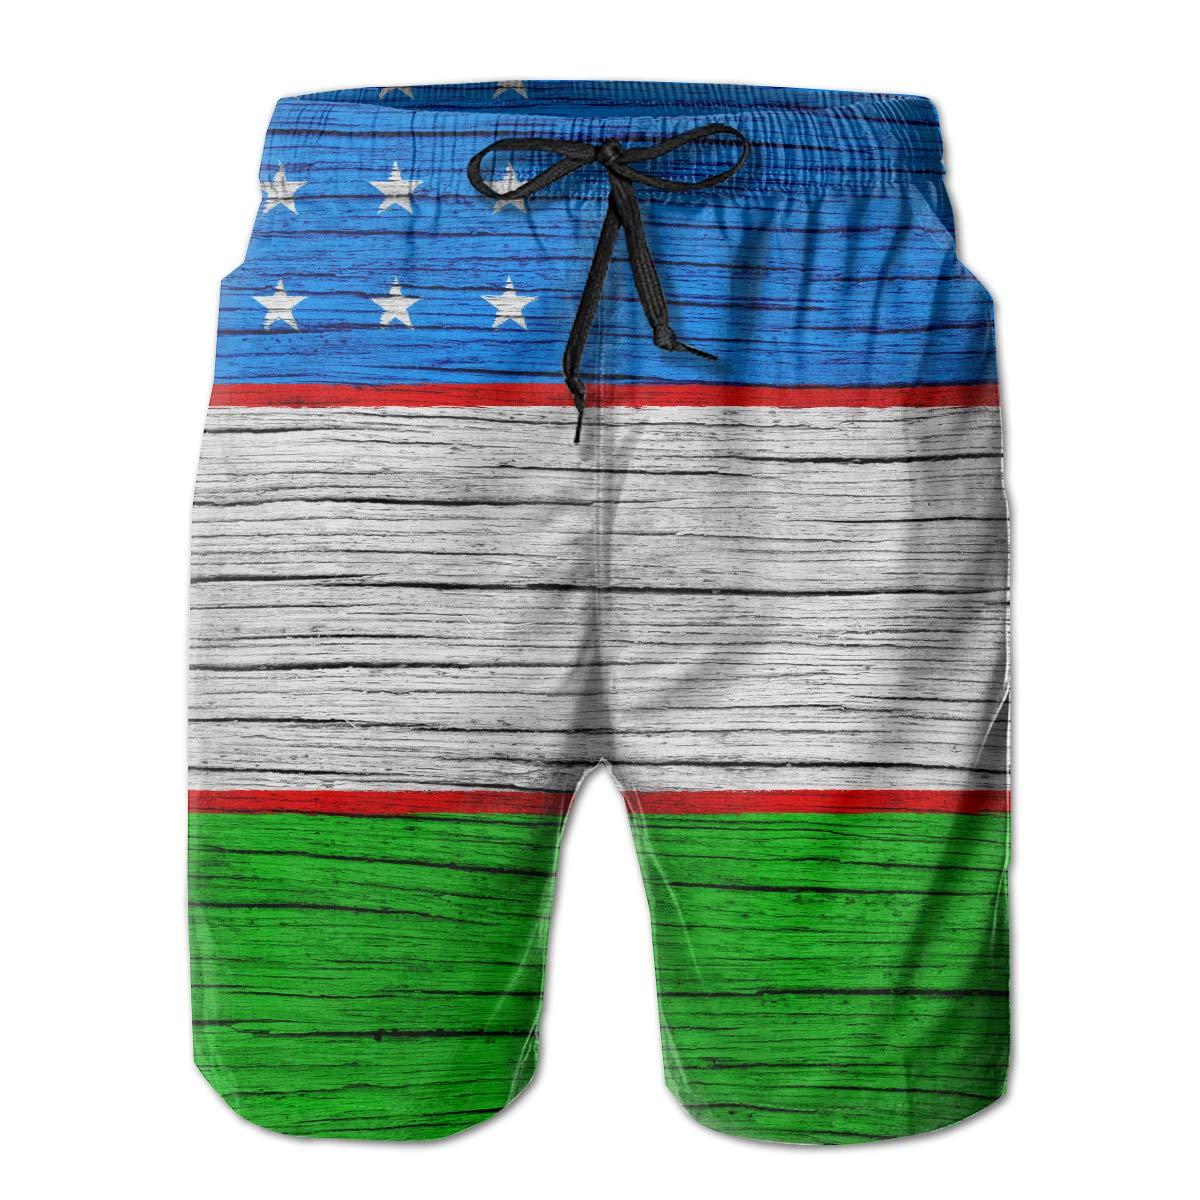 HFSST Uzbekistan Wooden Texture Uzbek Flag Men Kid Male Summer Swimming Pockets Trunks Beachwear Asual Shorts Pants Mesh